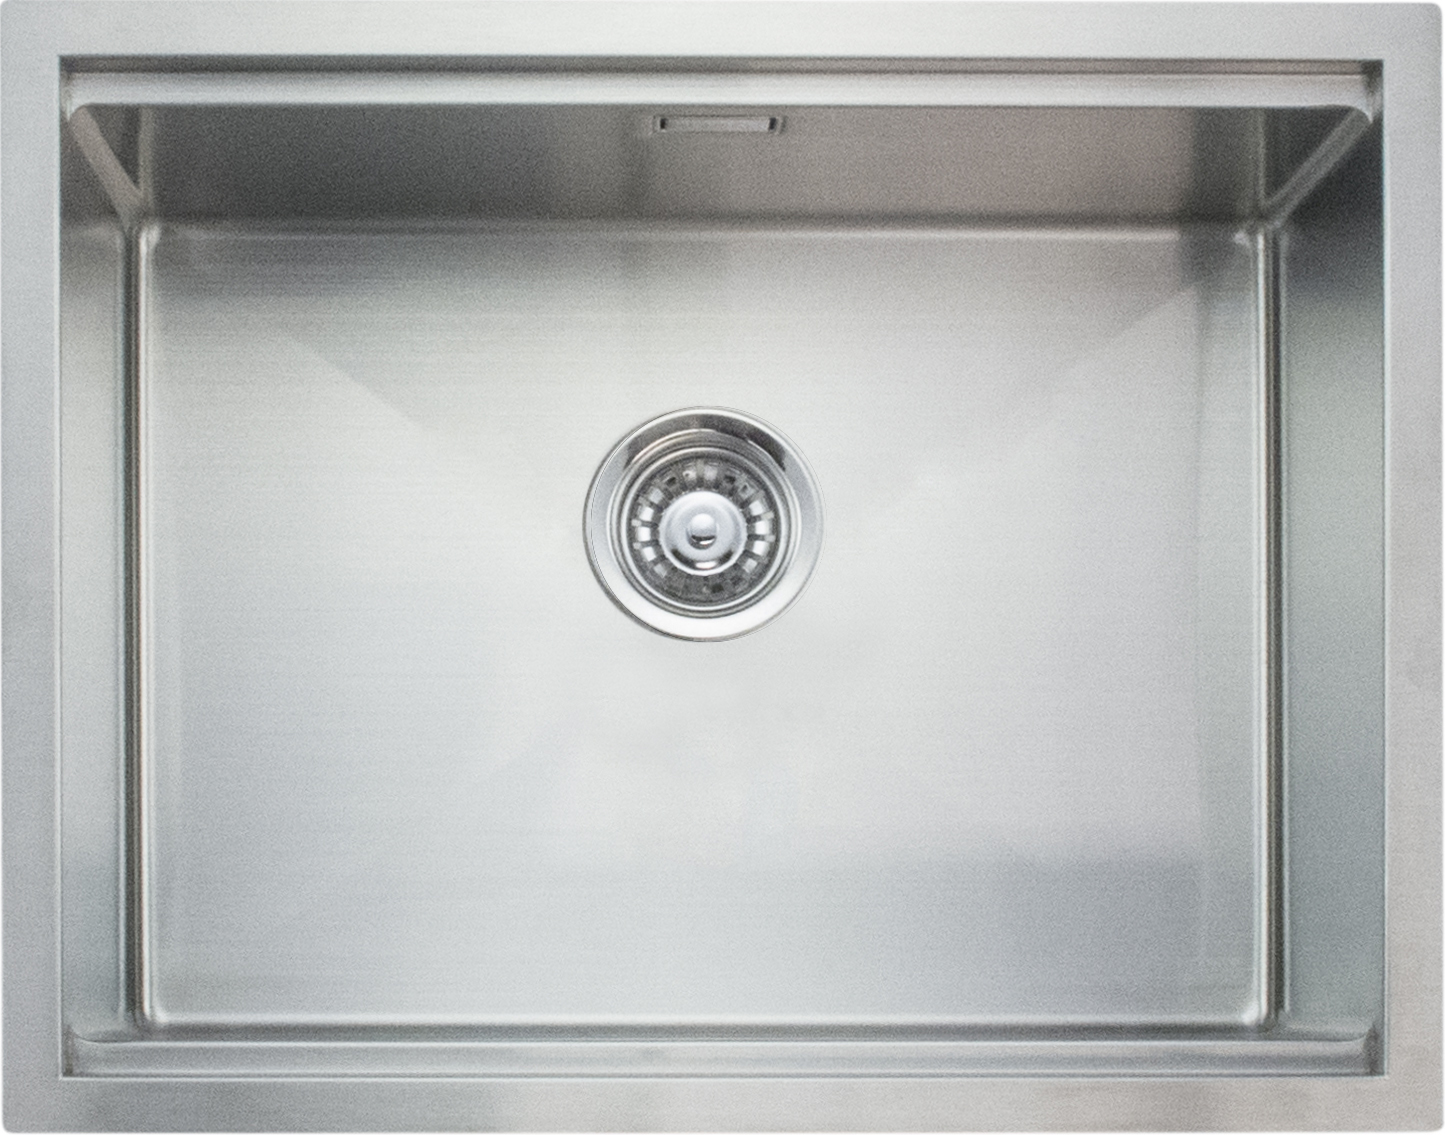 sink station small ik8550